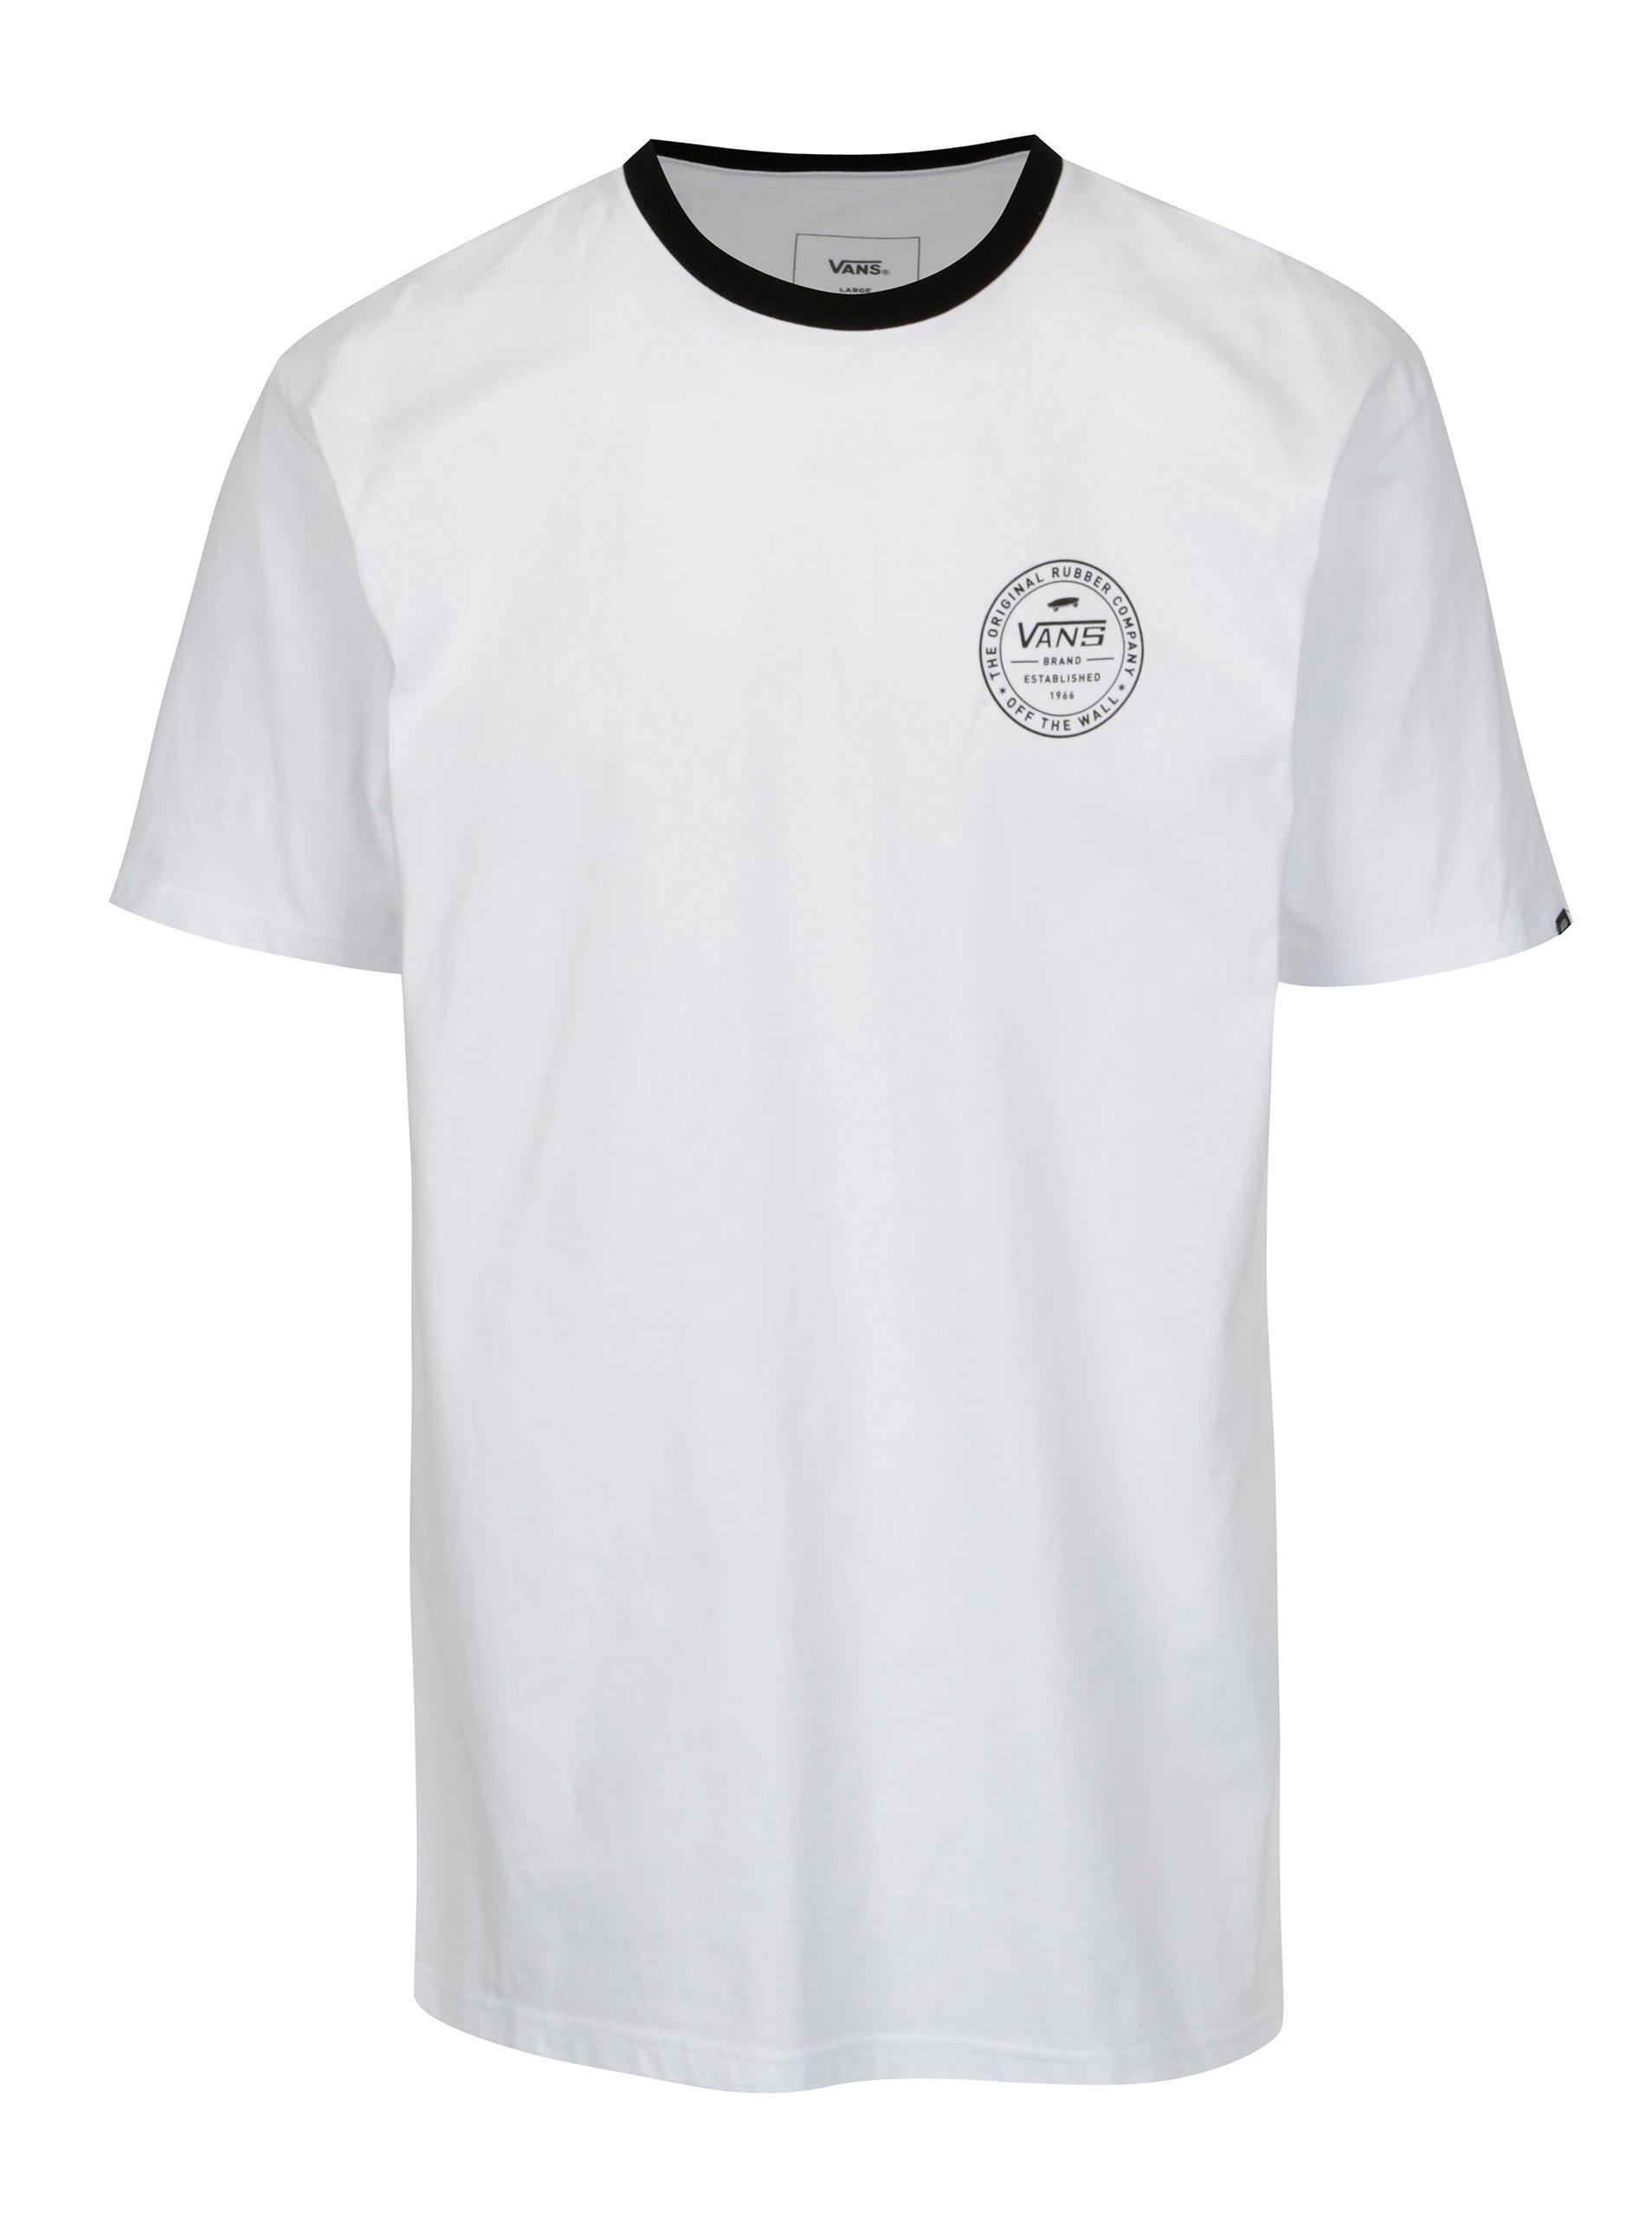 Čierno-biele pánske tričko VANS Established a47b4ebcb4f